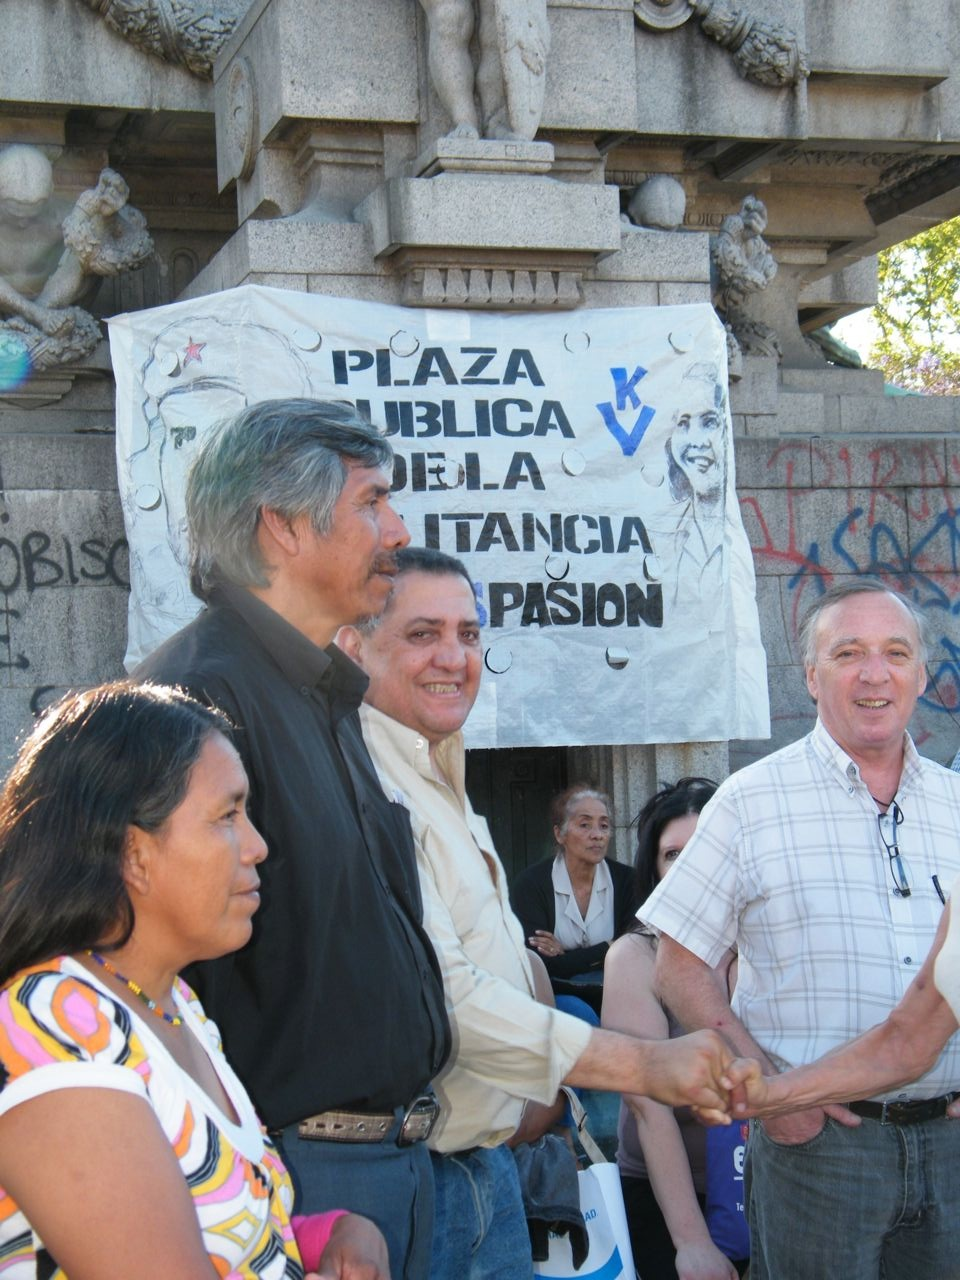 http://2.bp.blogspot.com/_rsh25GVRICc/TPvfiJL3aqI/AAAAAAAAA2Q/hVuN_20ezZ0/s1600/Plaza+Militancia3.jpg